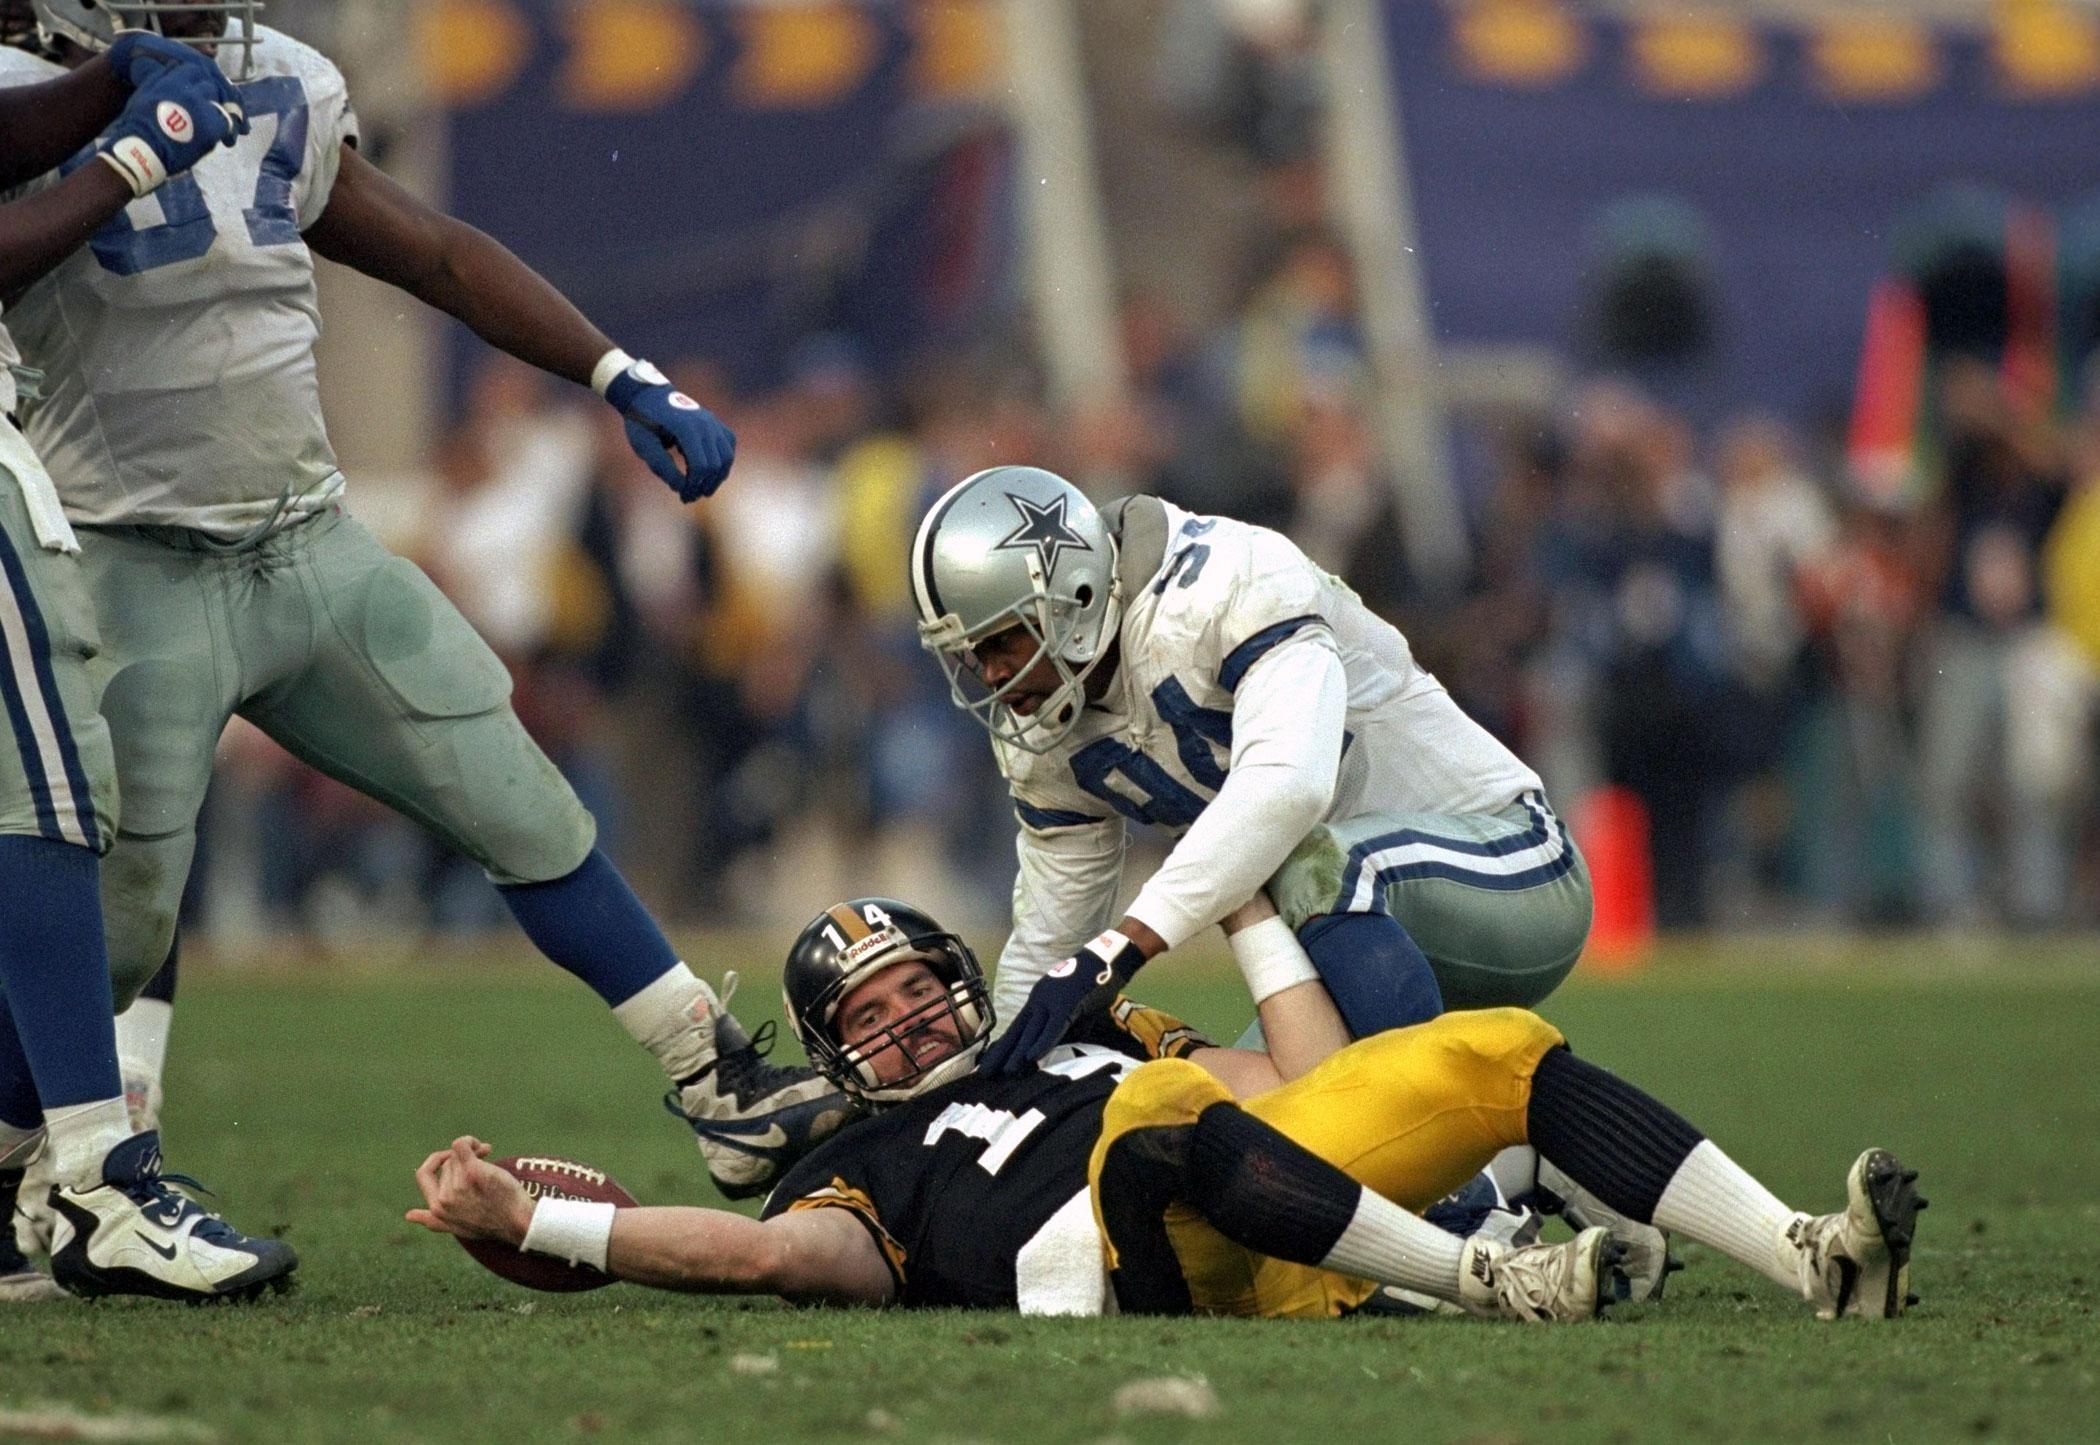 Super Bowl XXX, Jan. 28, 1996                               Dallas Cowboys vs Pittsburgh Steelers in Tempe, Ariz.